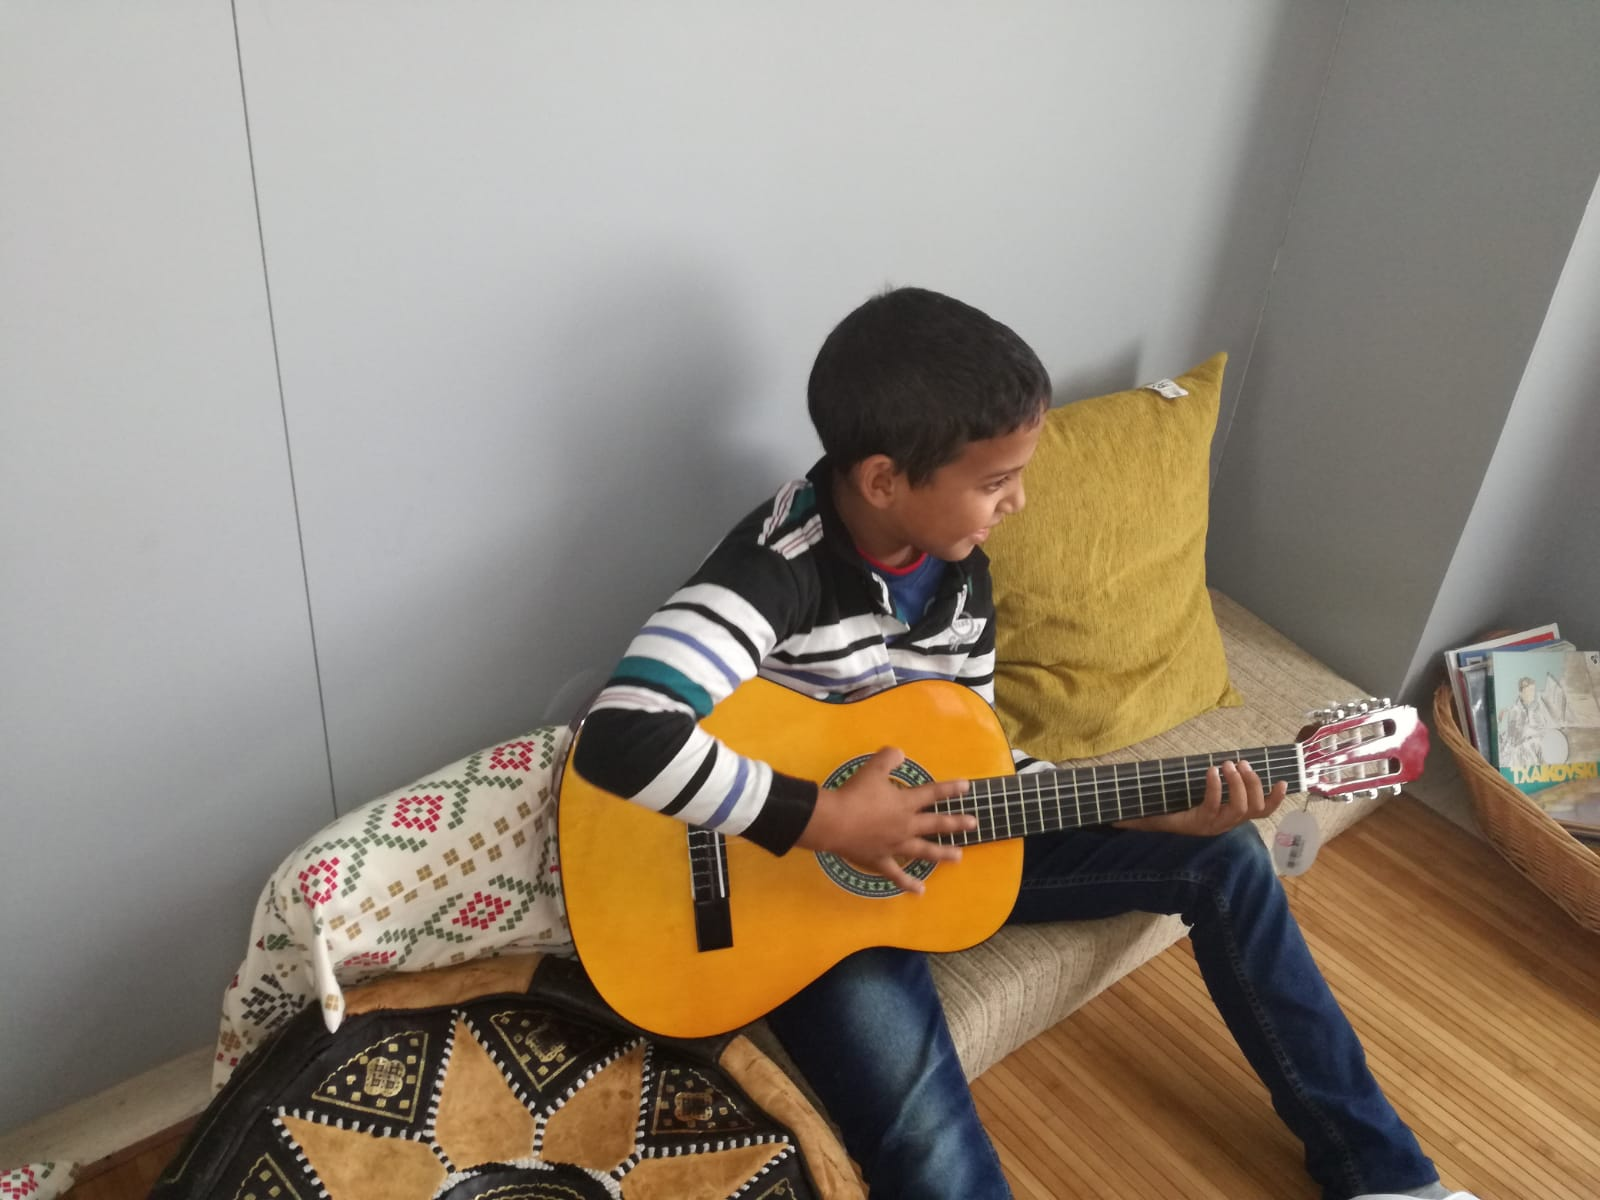 musicart cgs